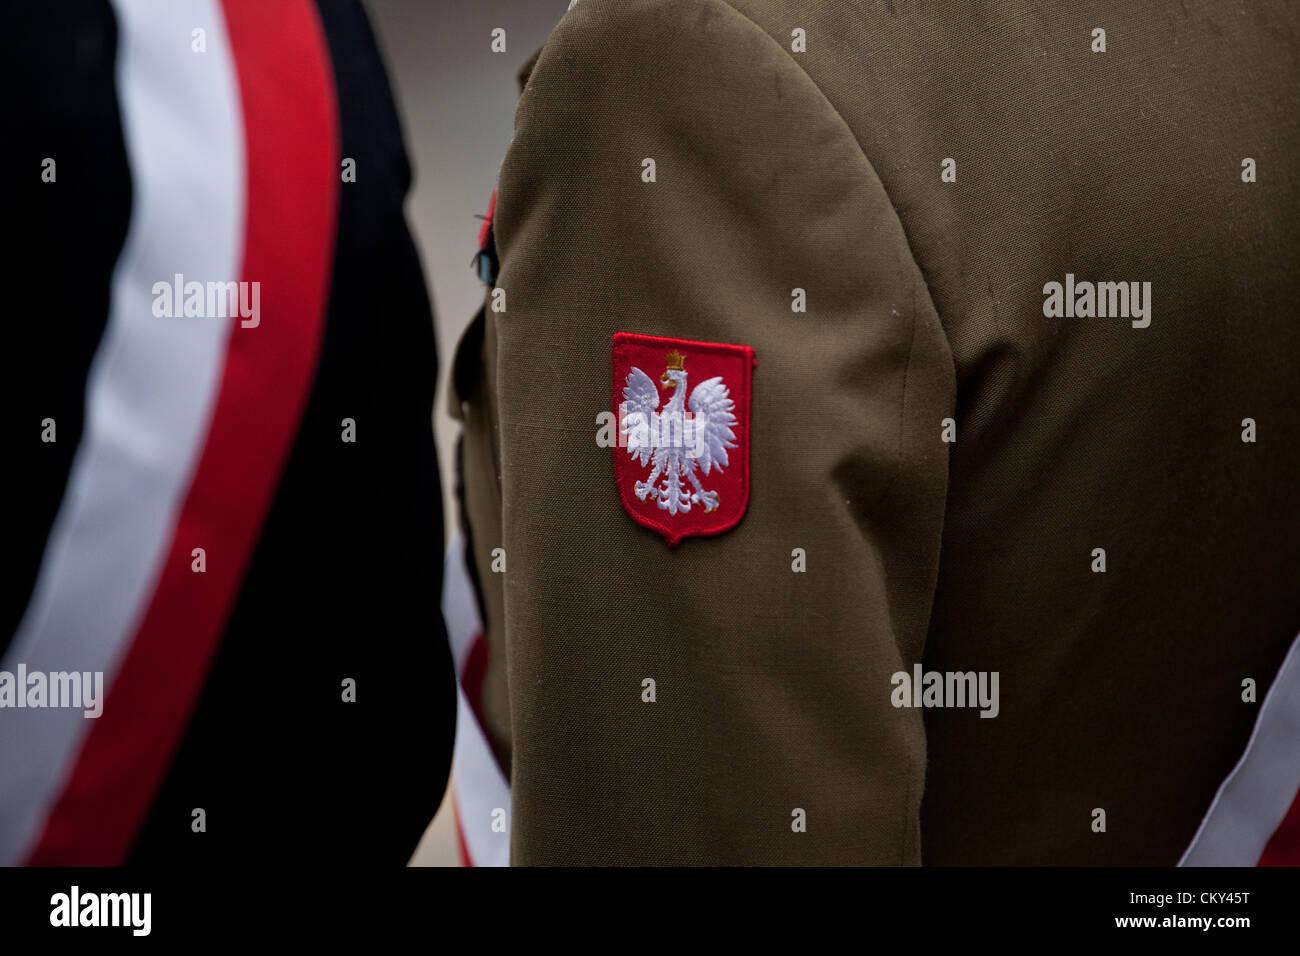 German Wwii Navy Battle Flag Stock Photos & German Wwii Navy